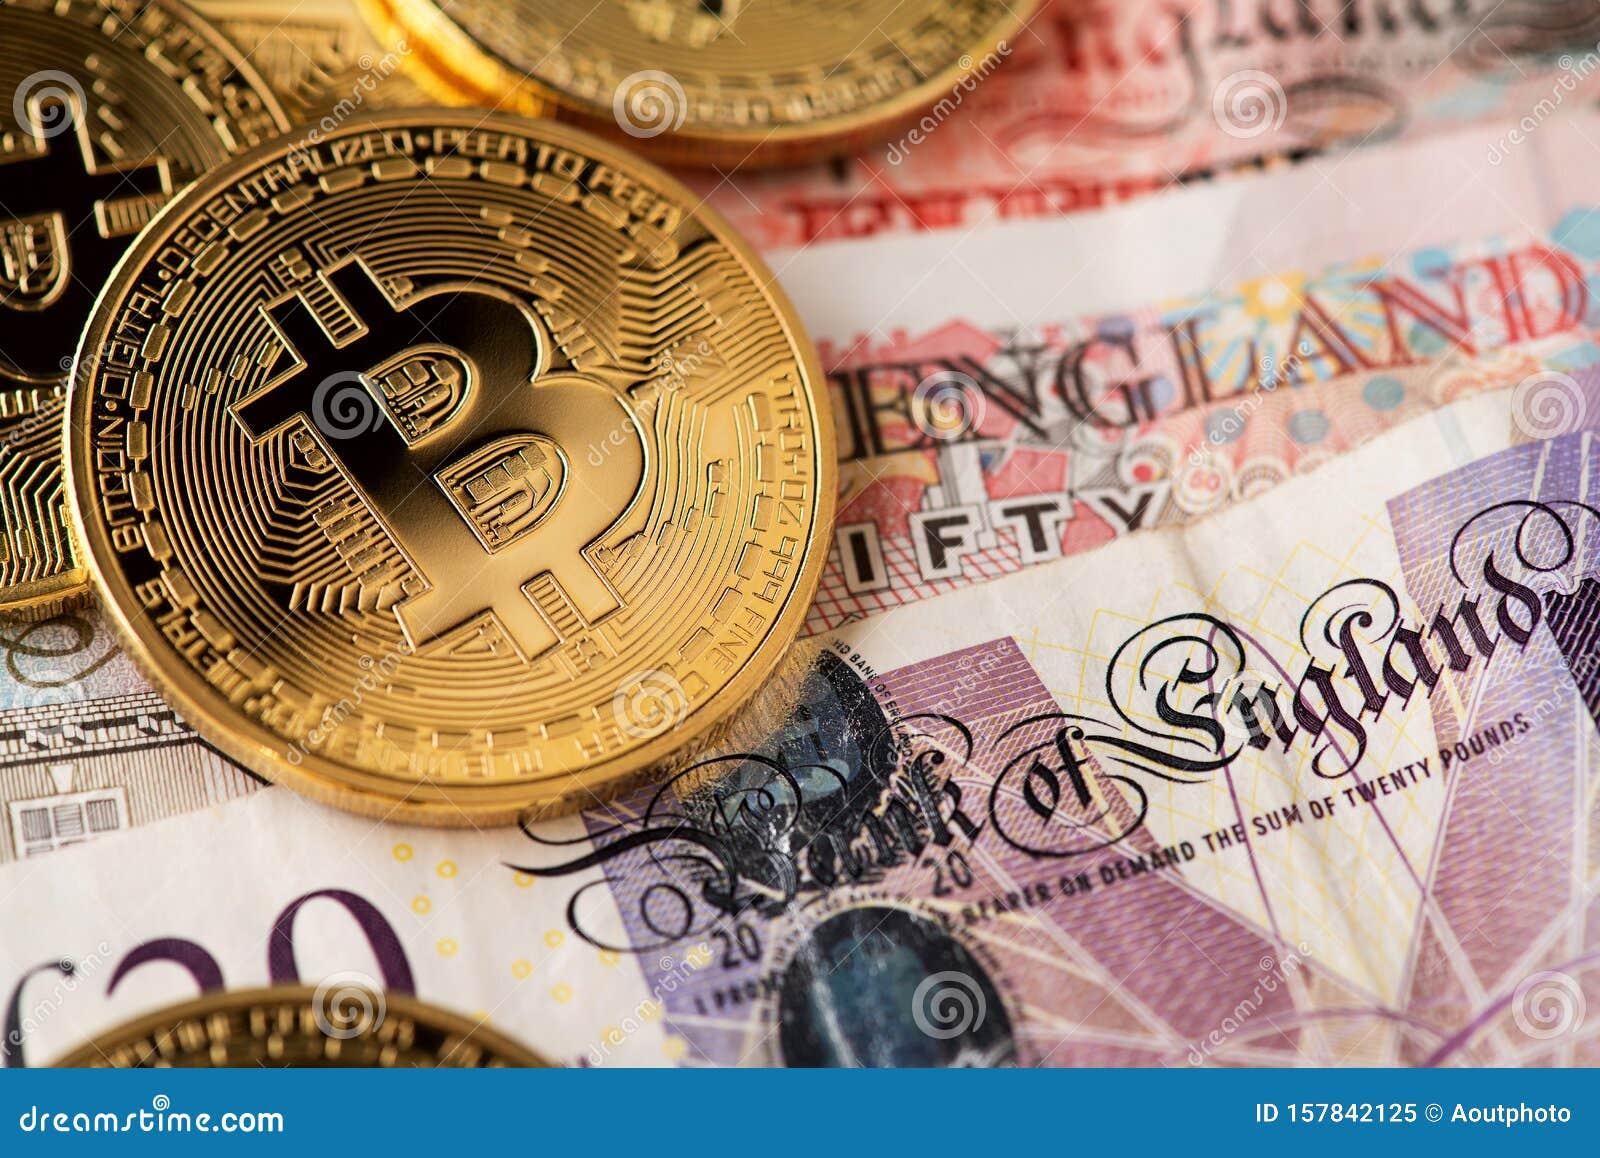 gbp bitcoin cash